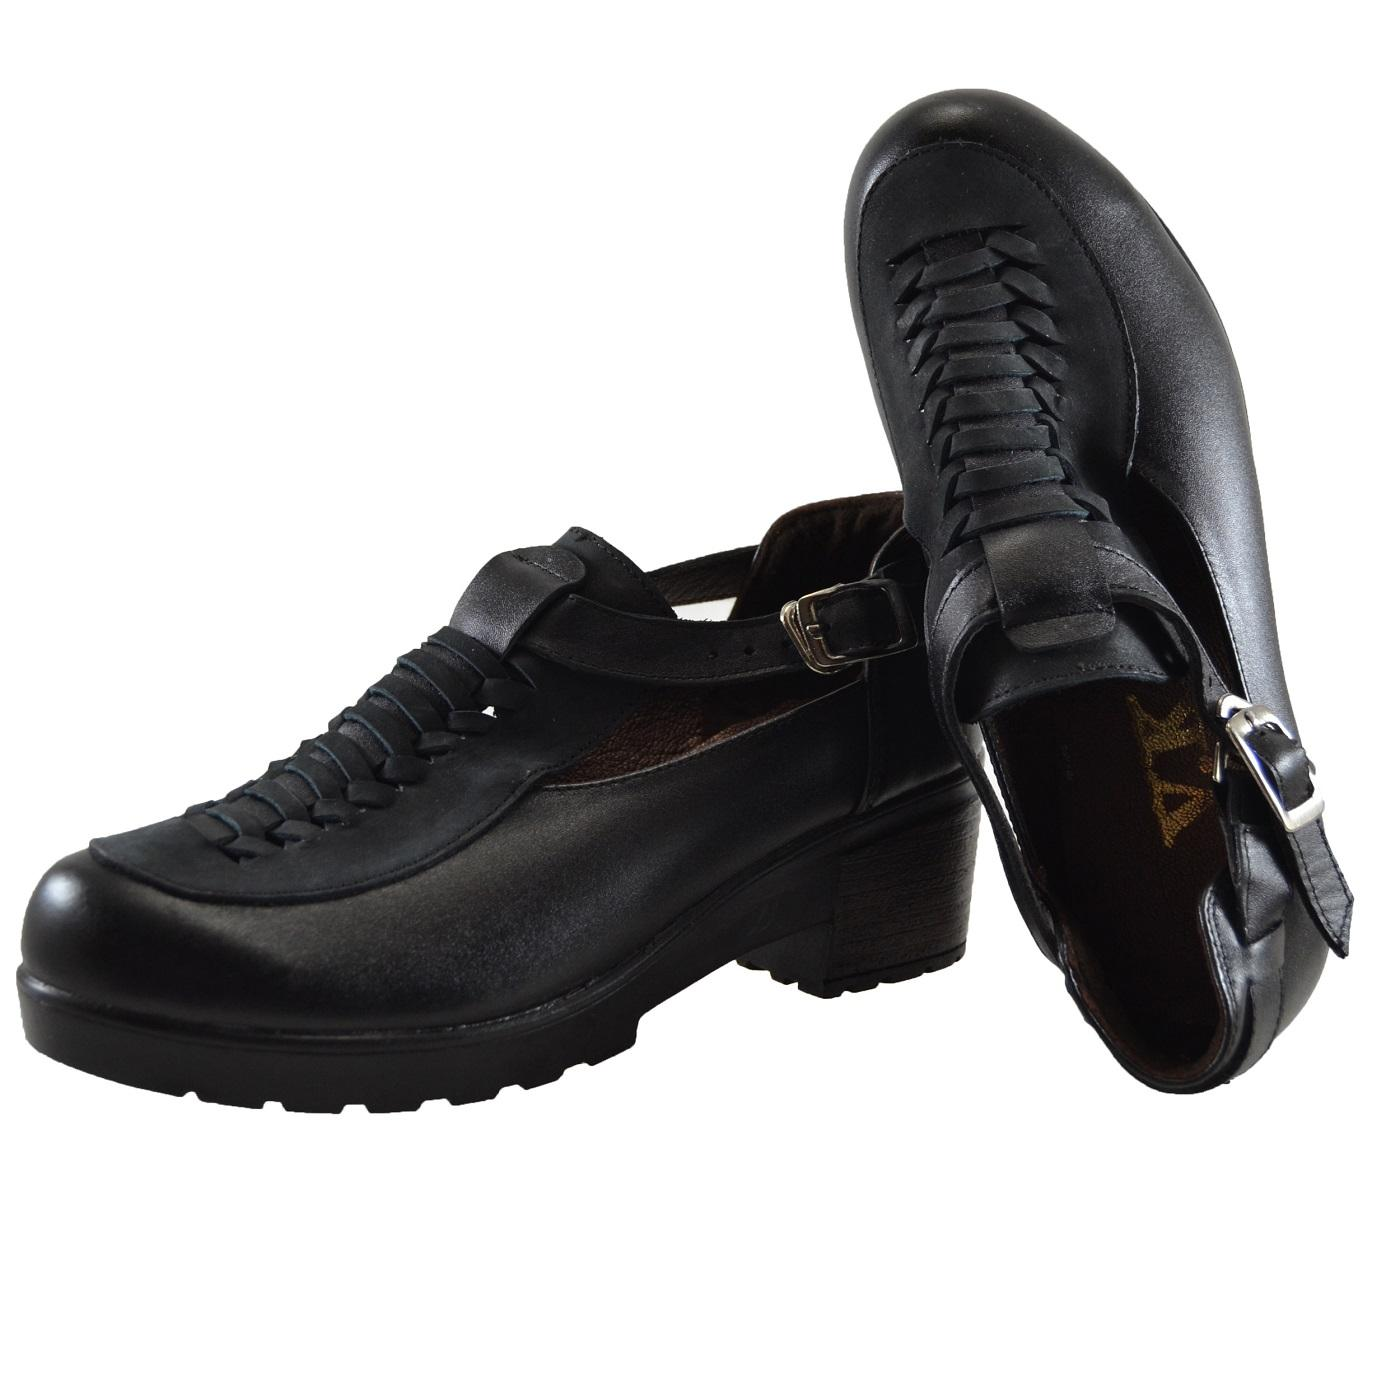 کفش زنانه کد 461 -  - 2